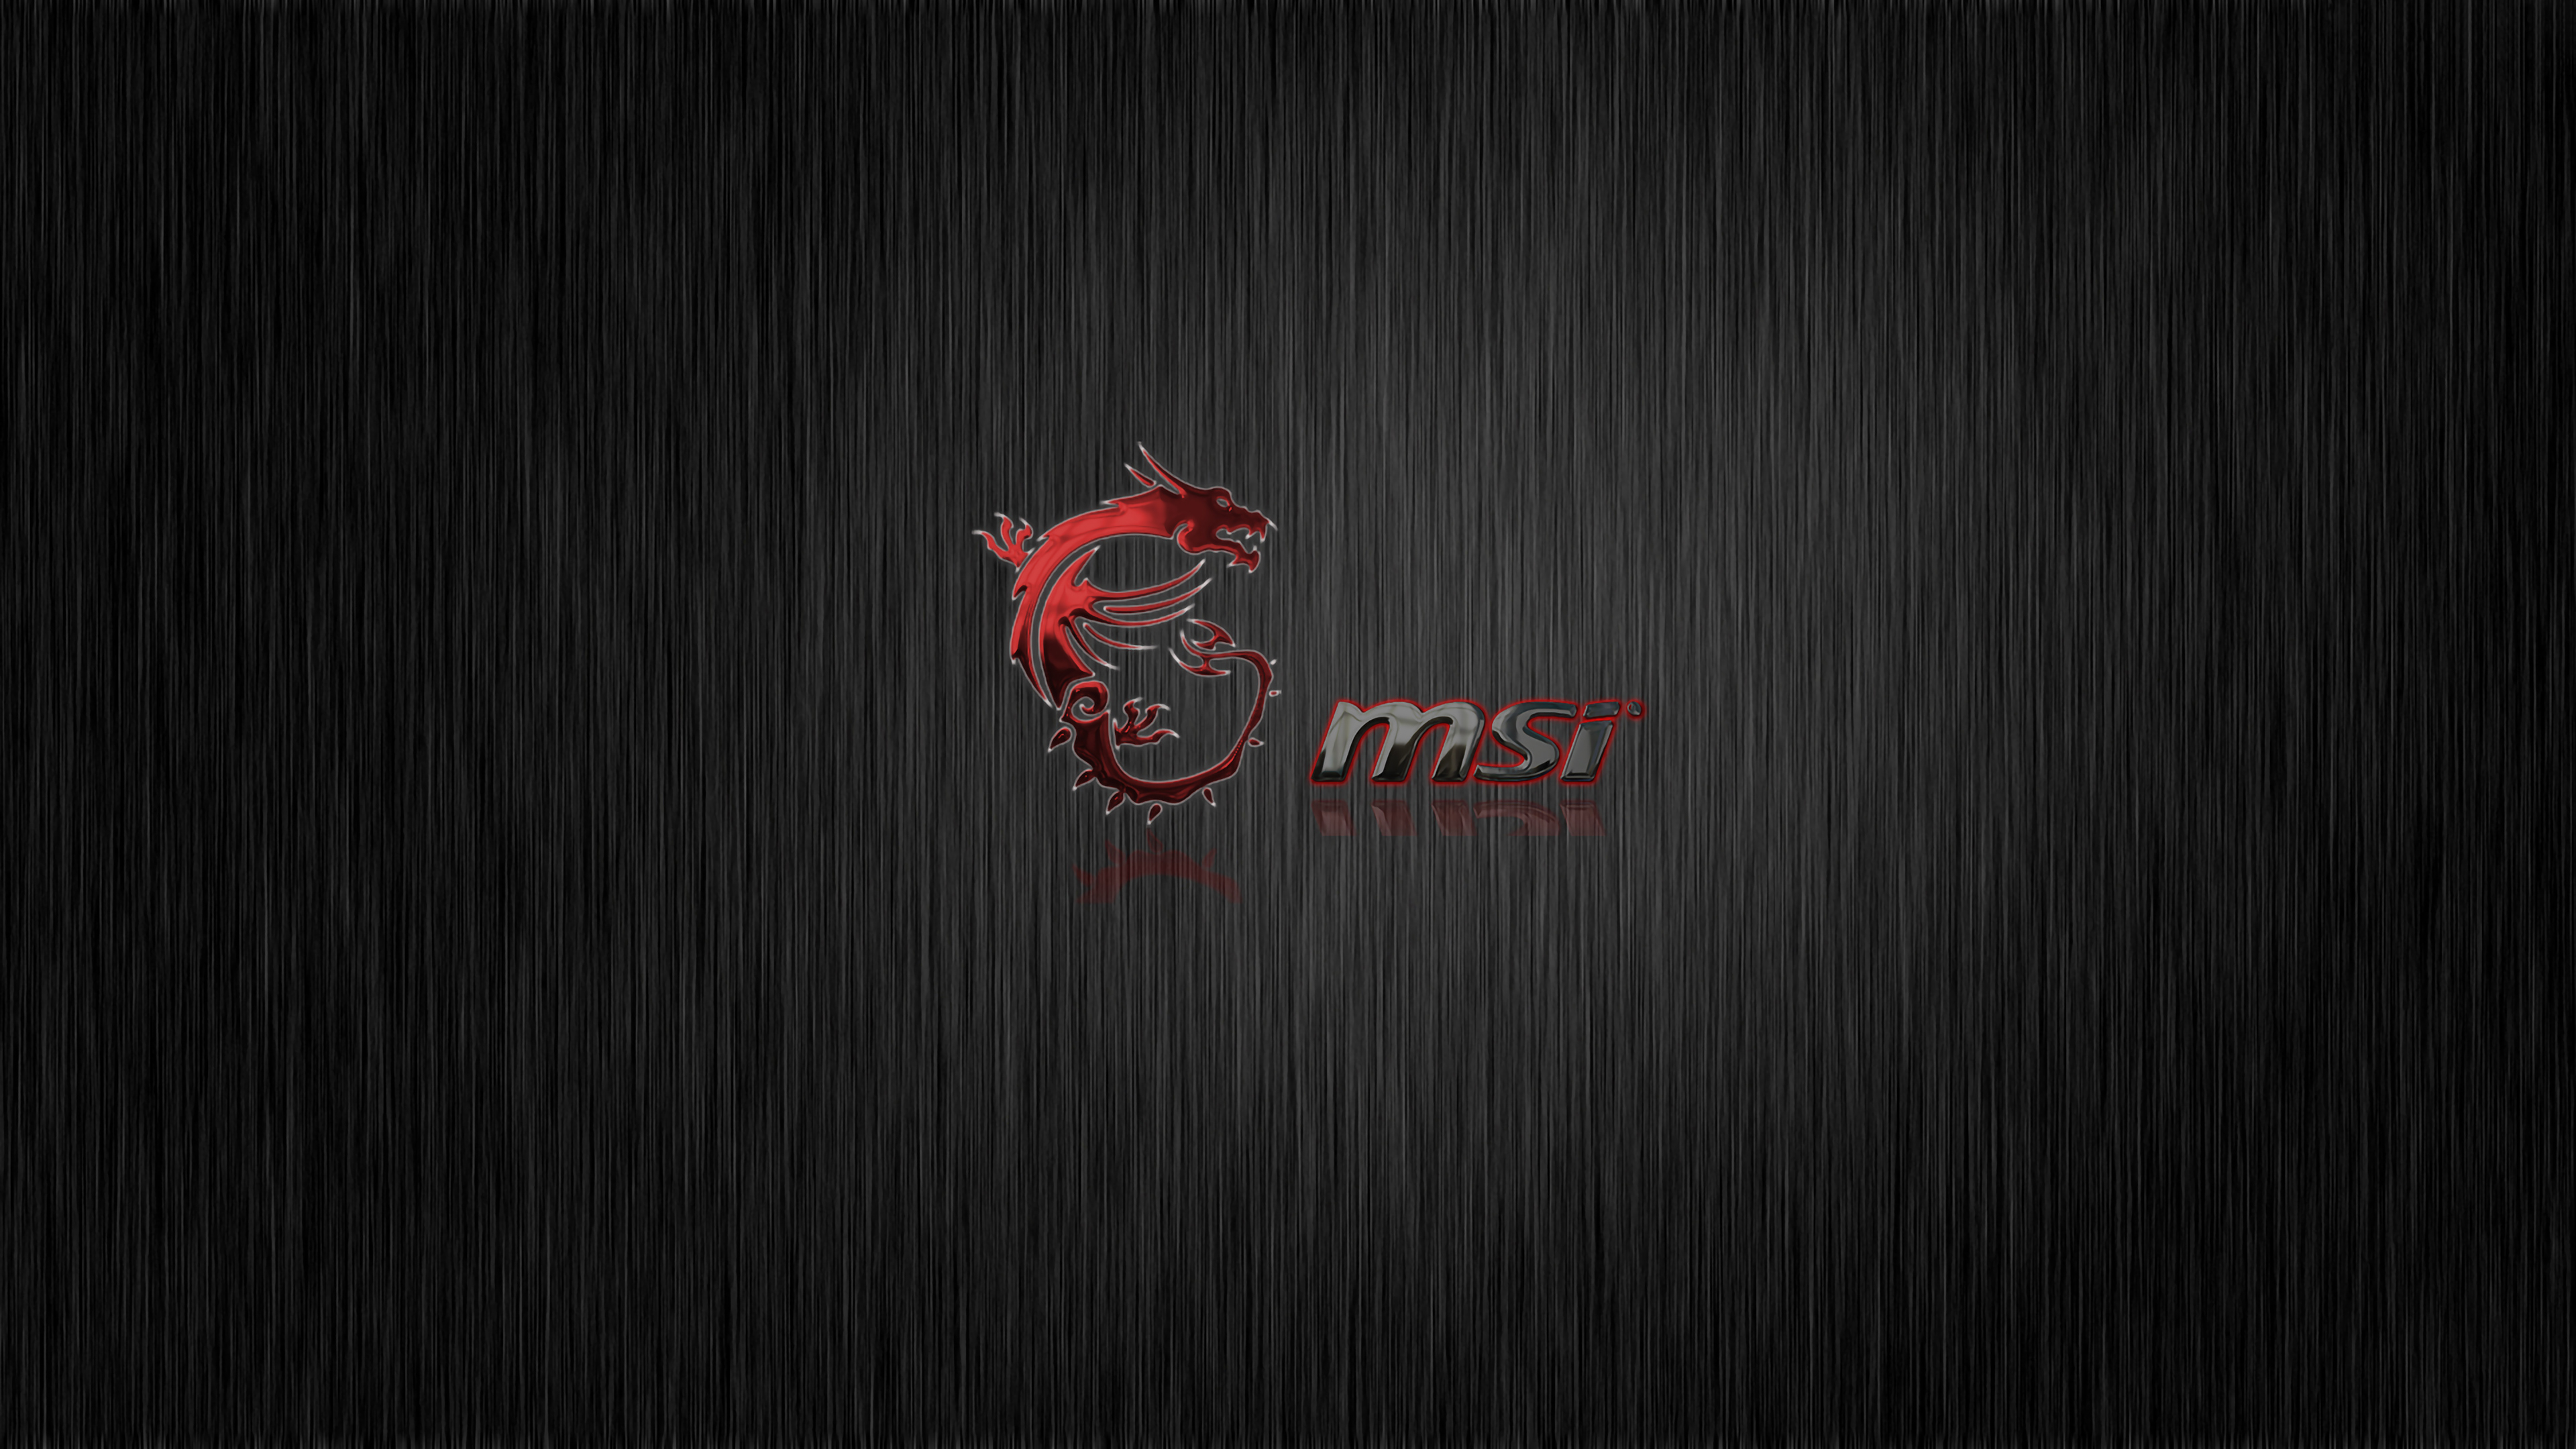 MSI gaming wallpaper for pc